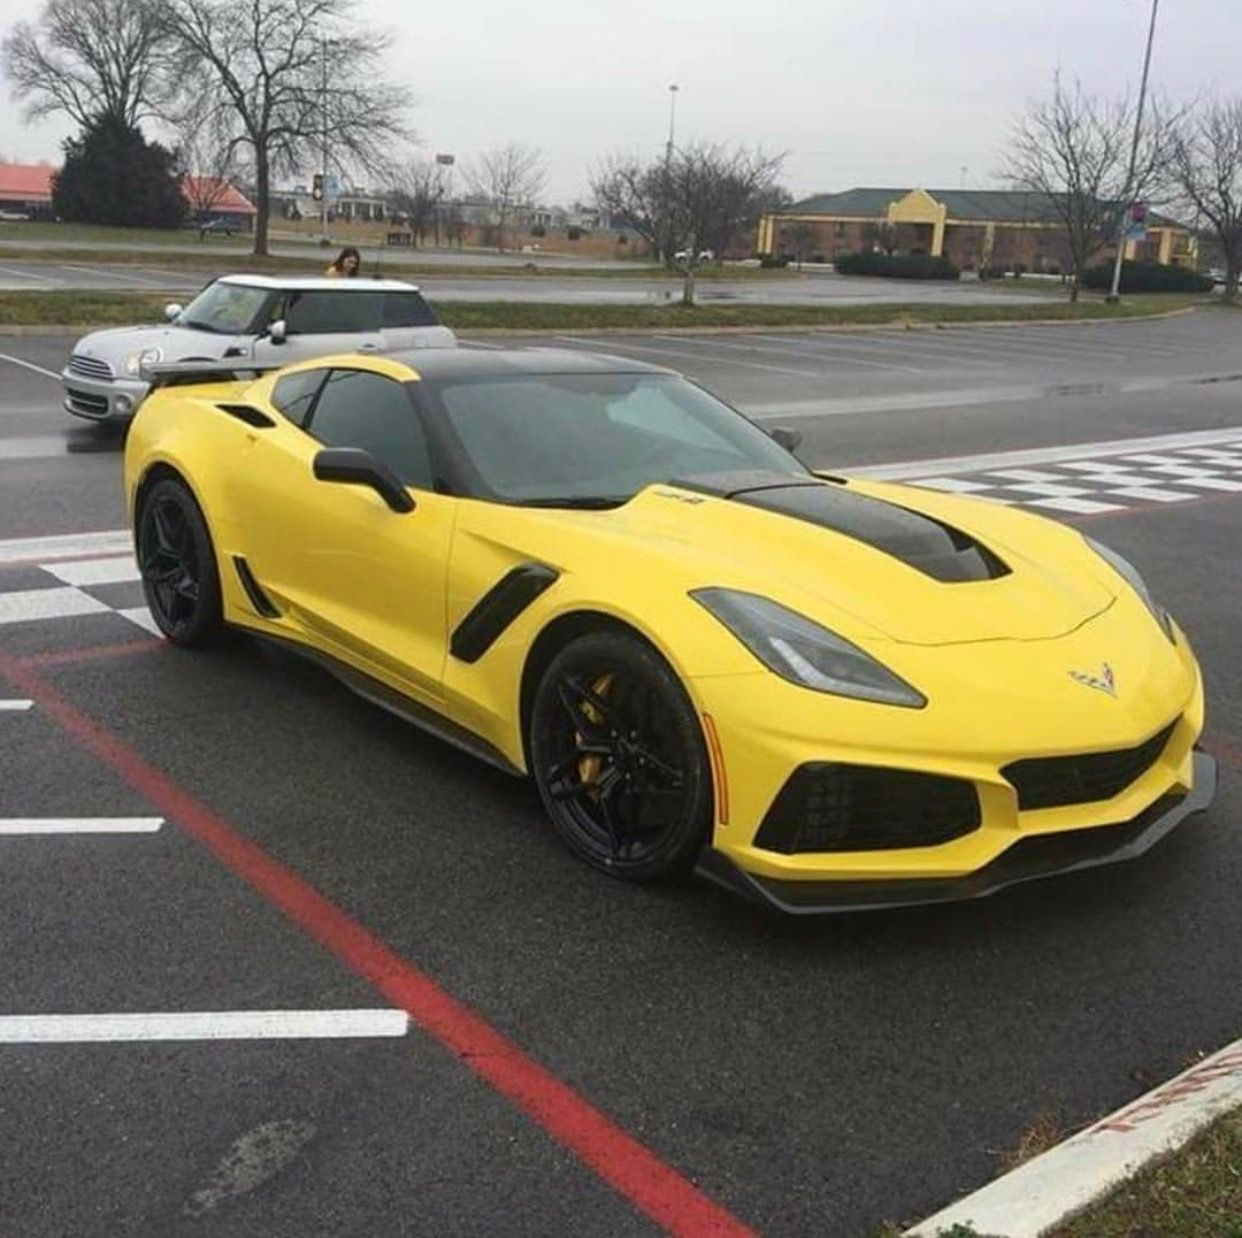 Chevrolet Corvette C7 Zr1 Painted In Corvette Racing Yellow Photo Taken By C7 Jay On Instagram In 2020 Chevrolet Corvette C7 Chevy Corvette Chevrolet